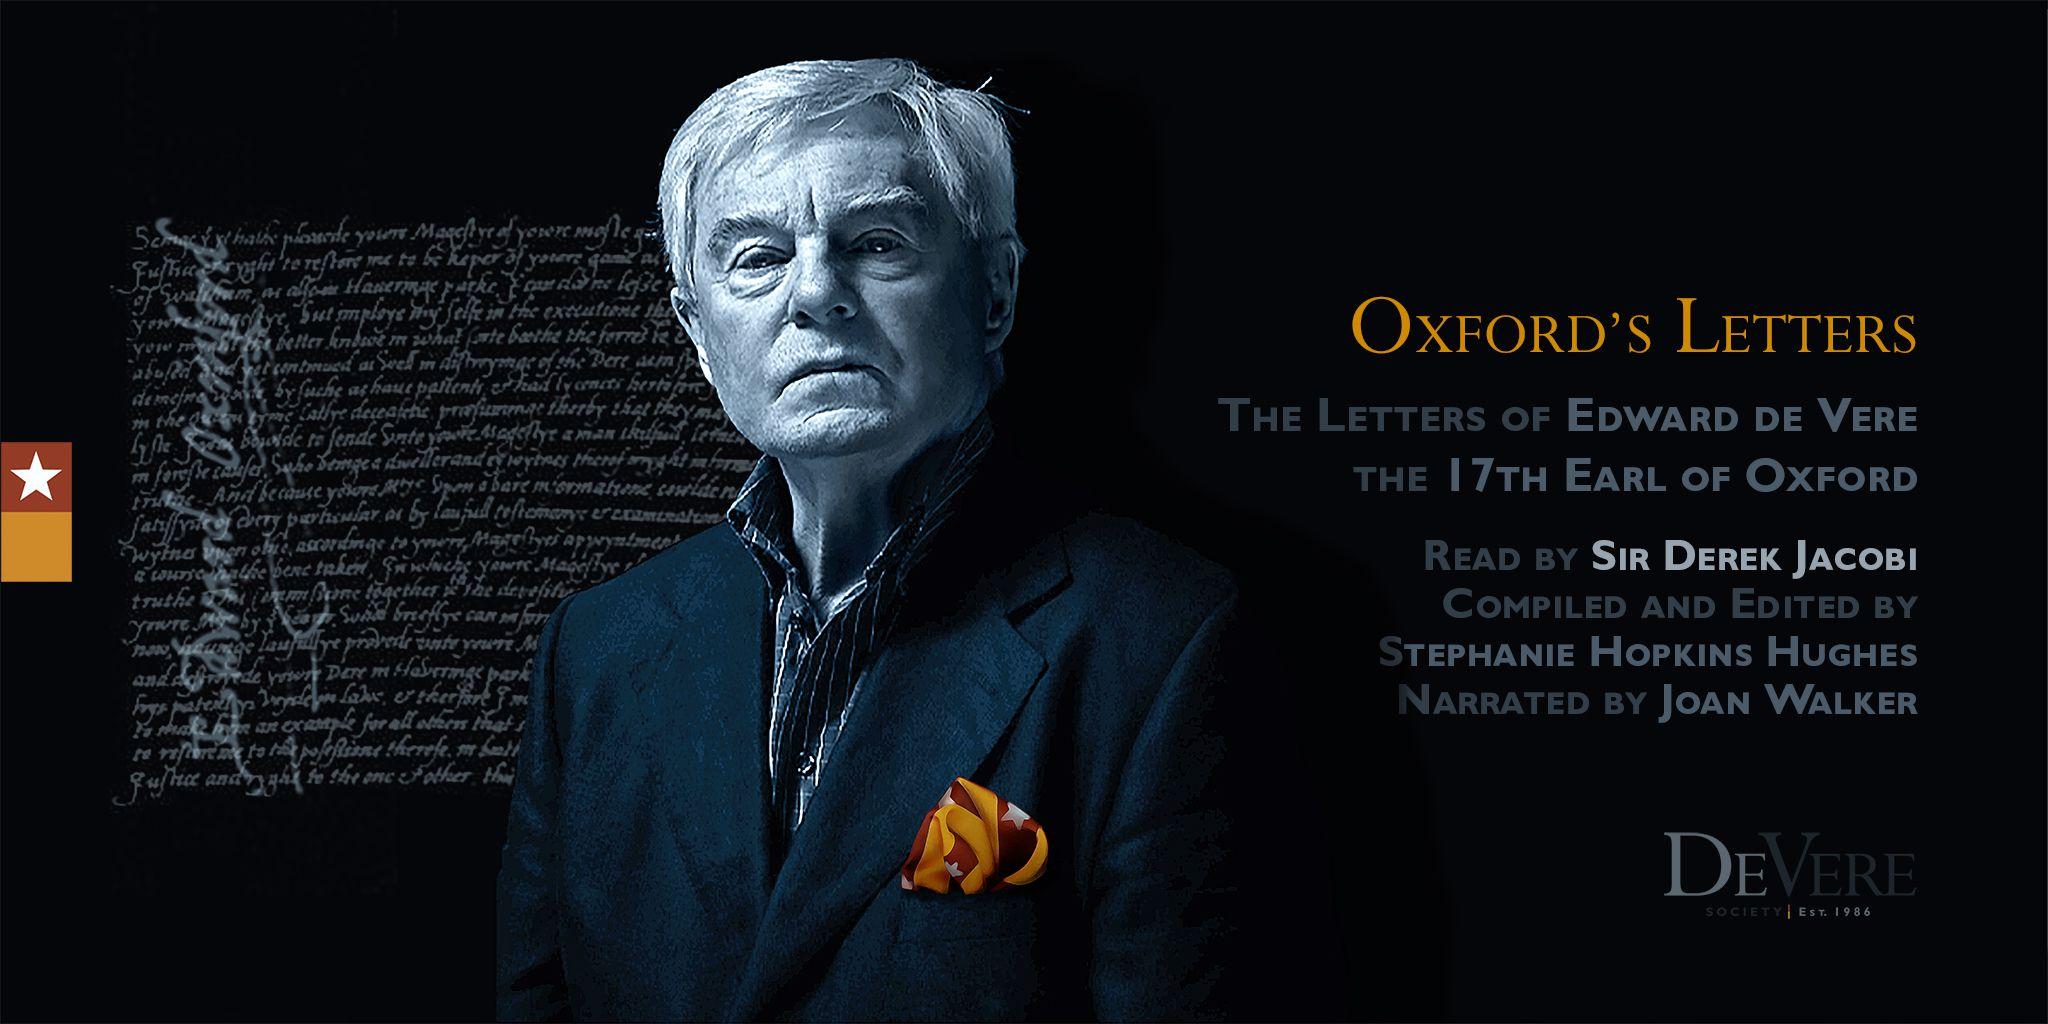 Oxford's Letters read by Sir Derek Jacobi